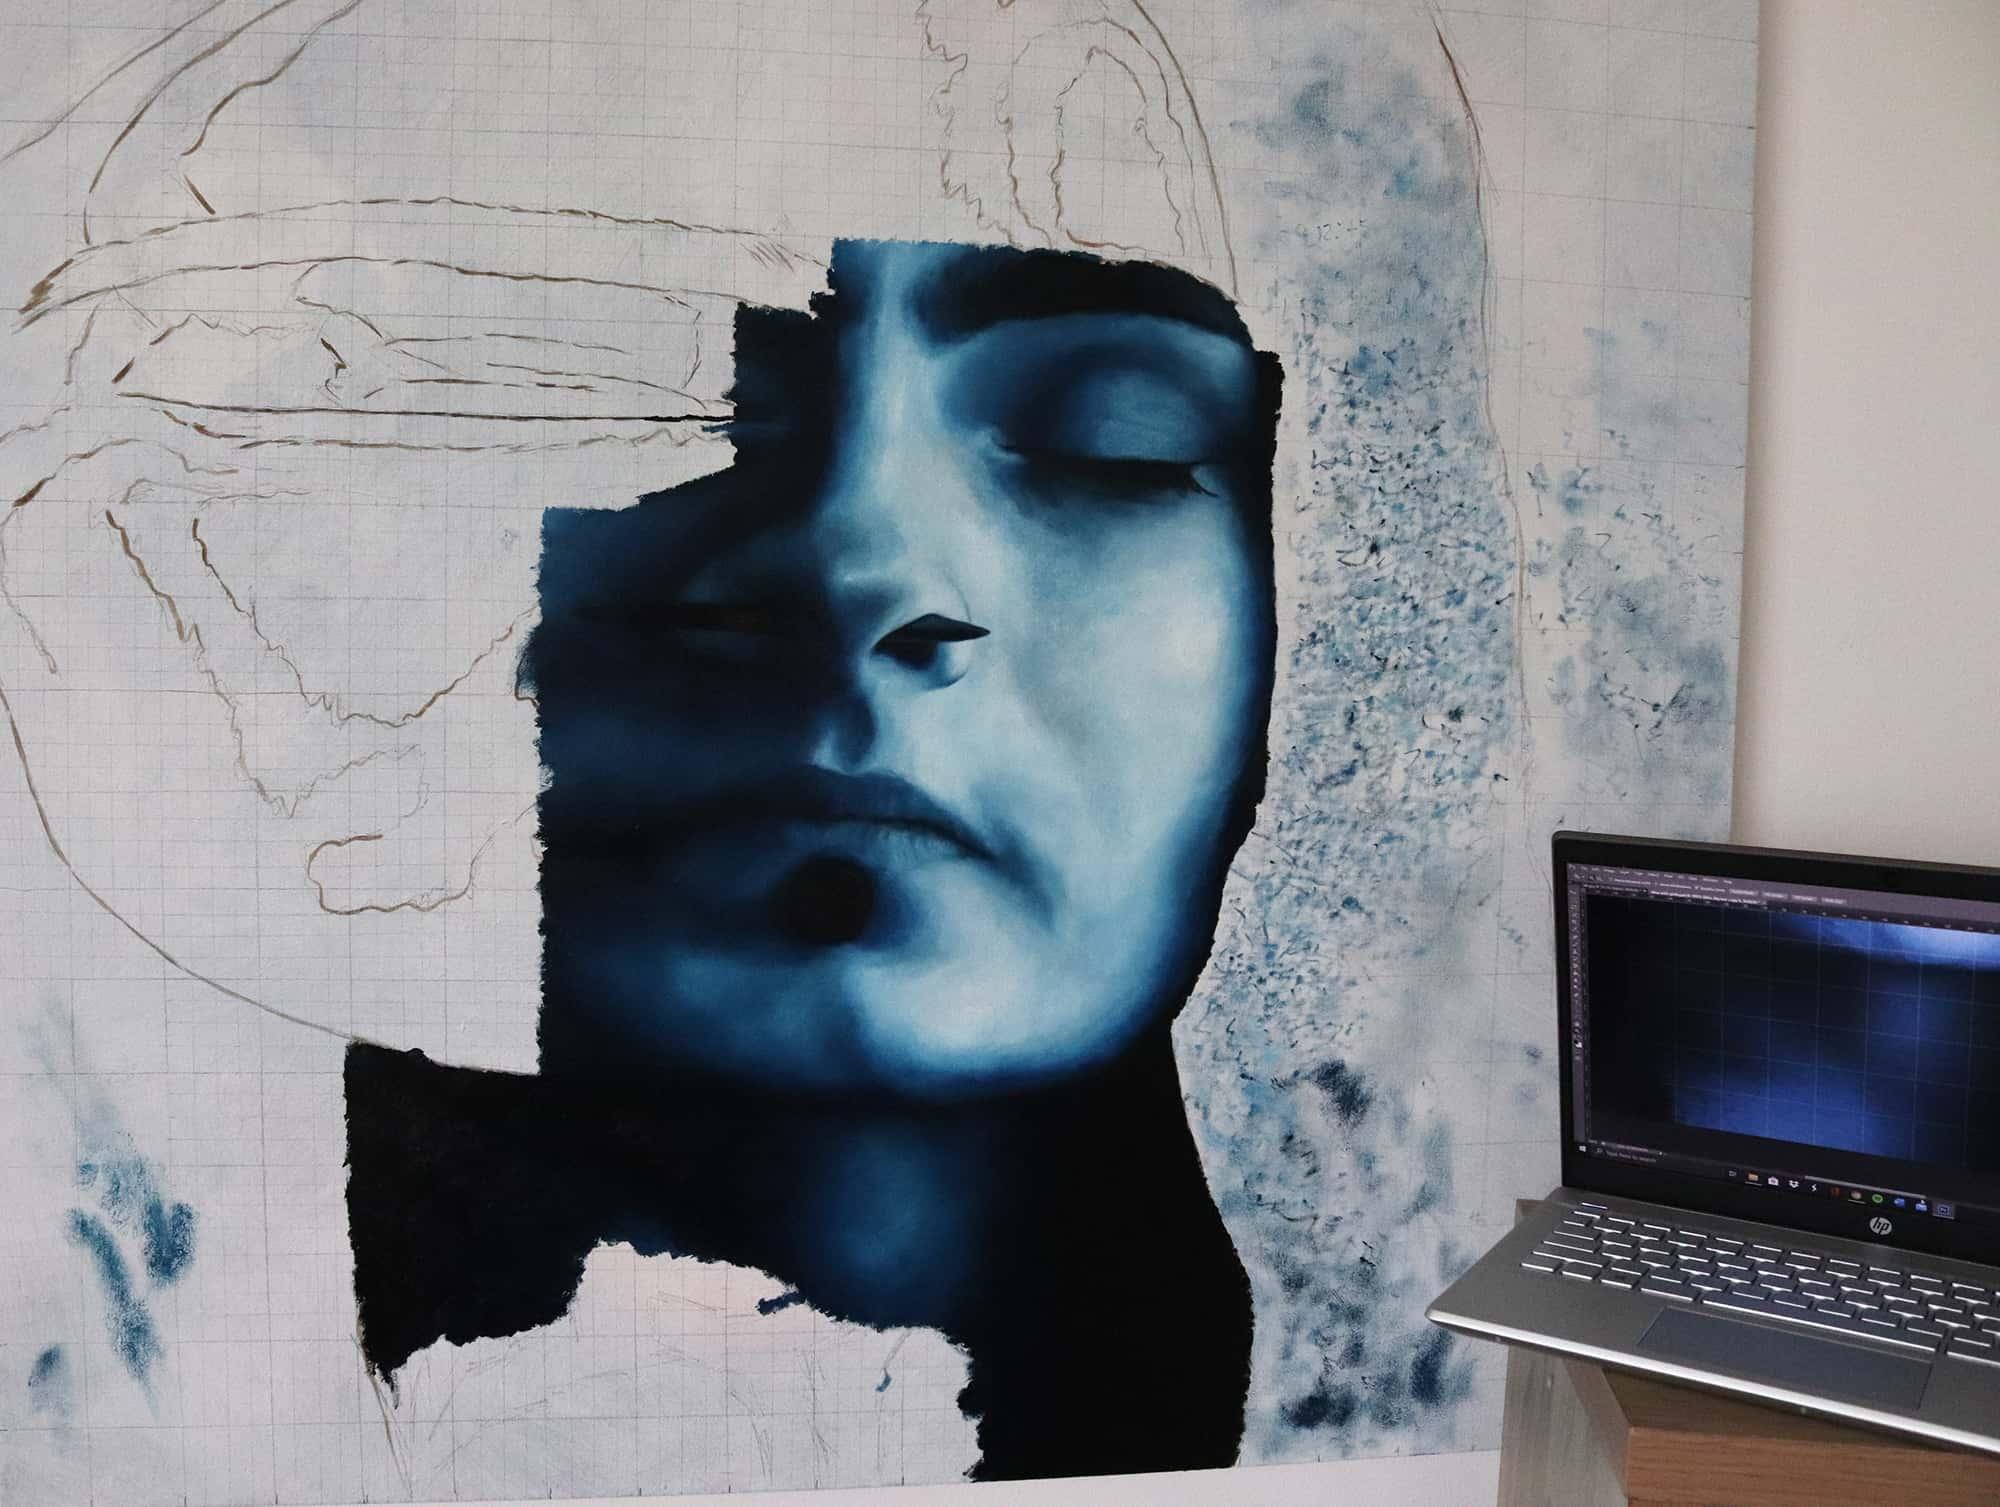 Jordan-Younger-MA-Fine-Art-University -of-Sunderland-Creatives